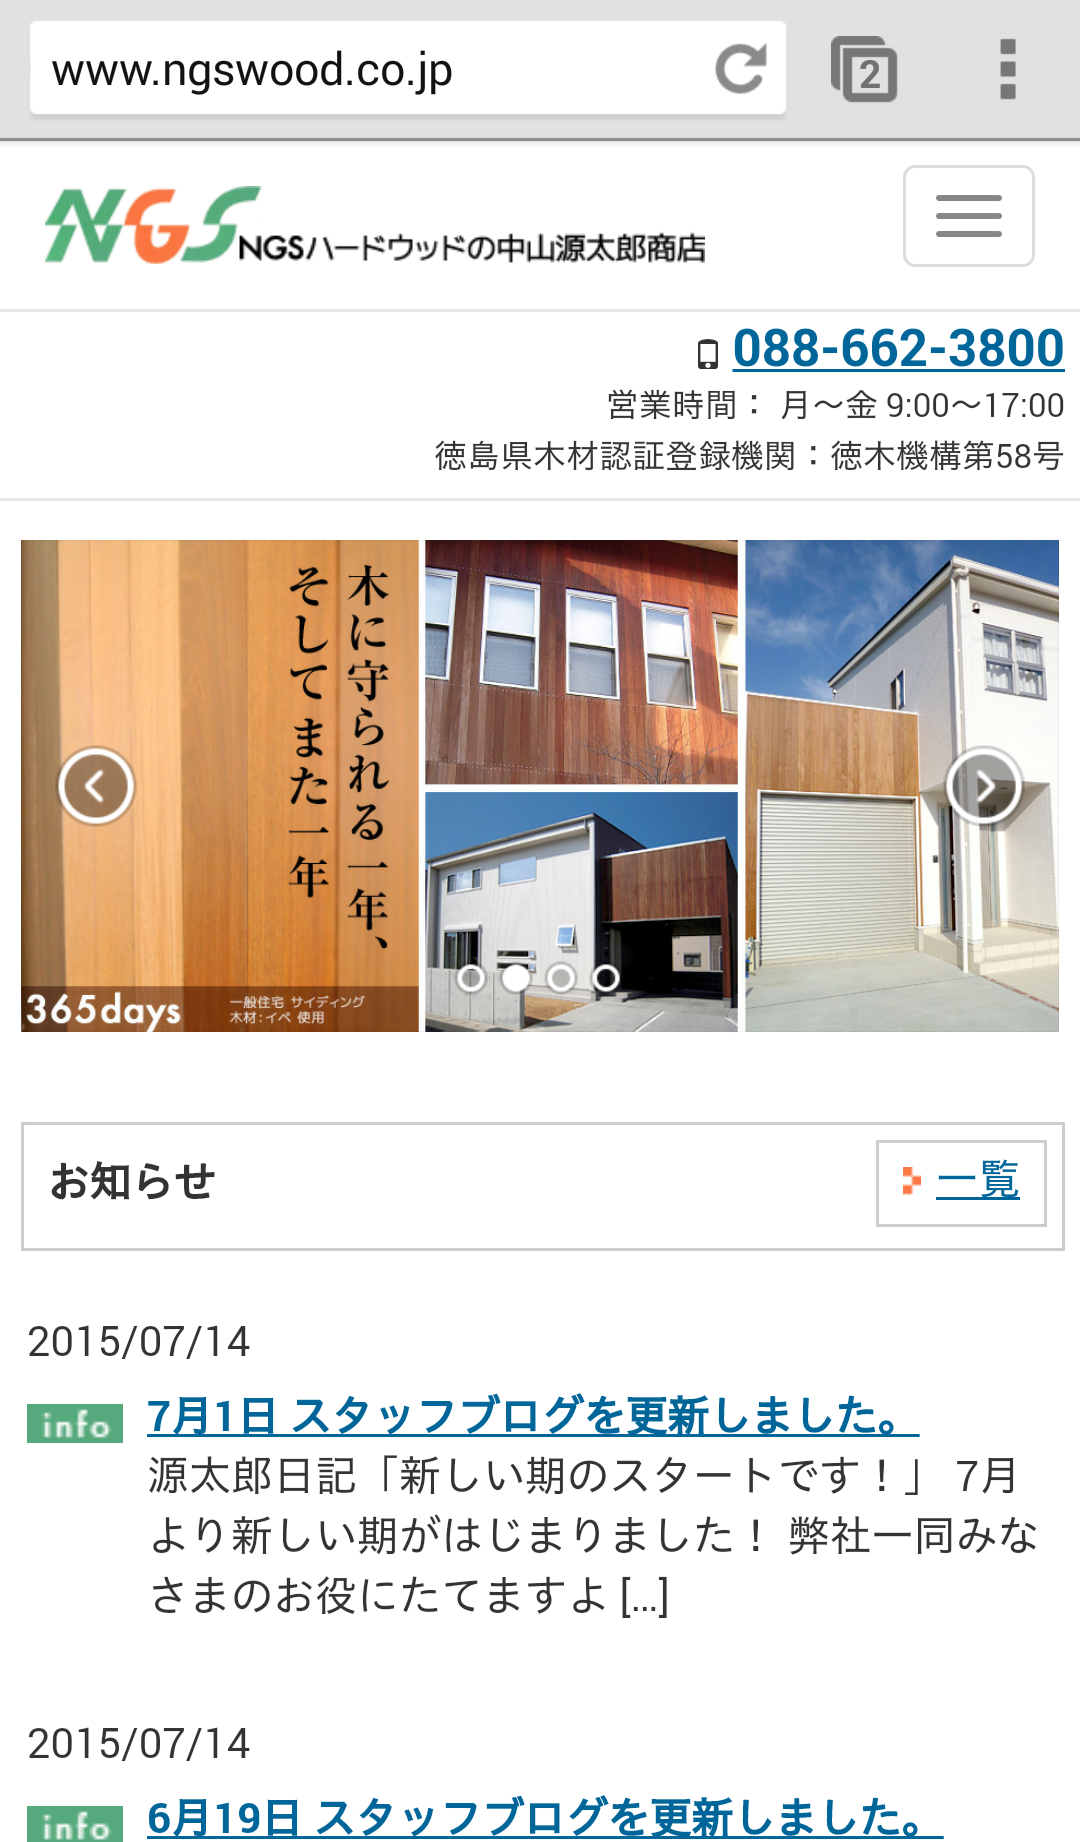 NGSハードウッド 中山源太郎商店